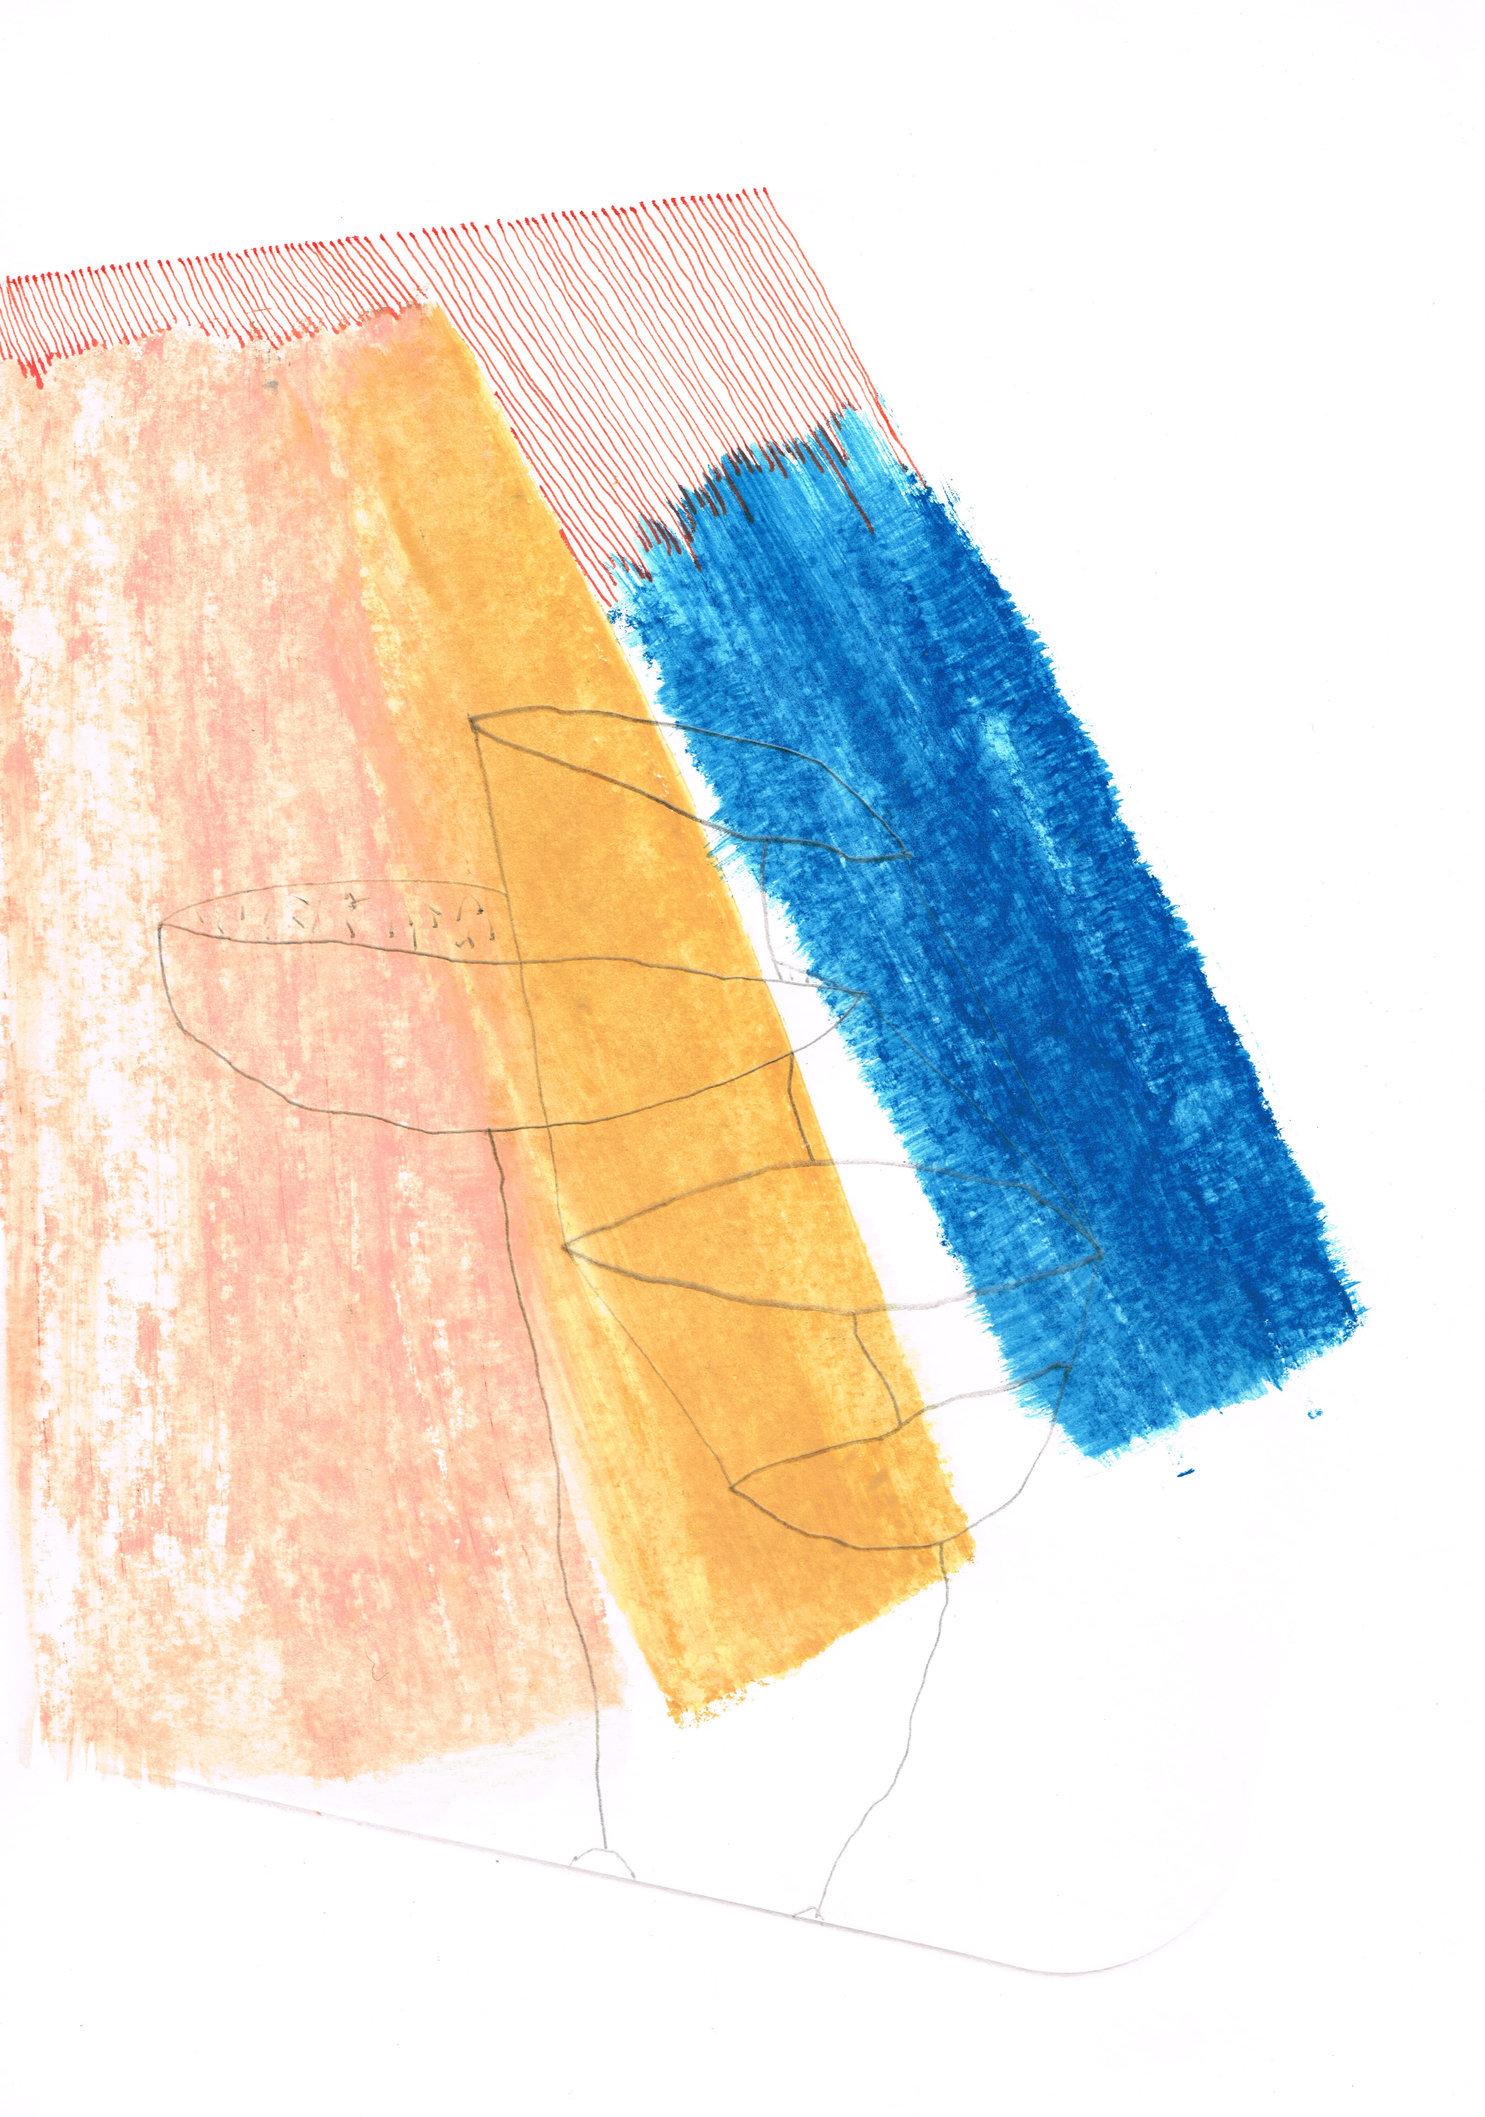 Zonder Titel, 2016, 20,8 x 29,7 cm